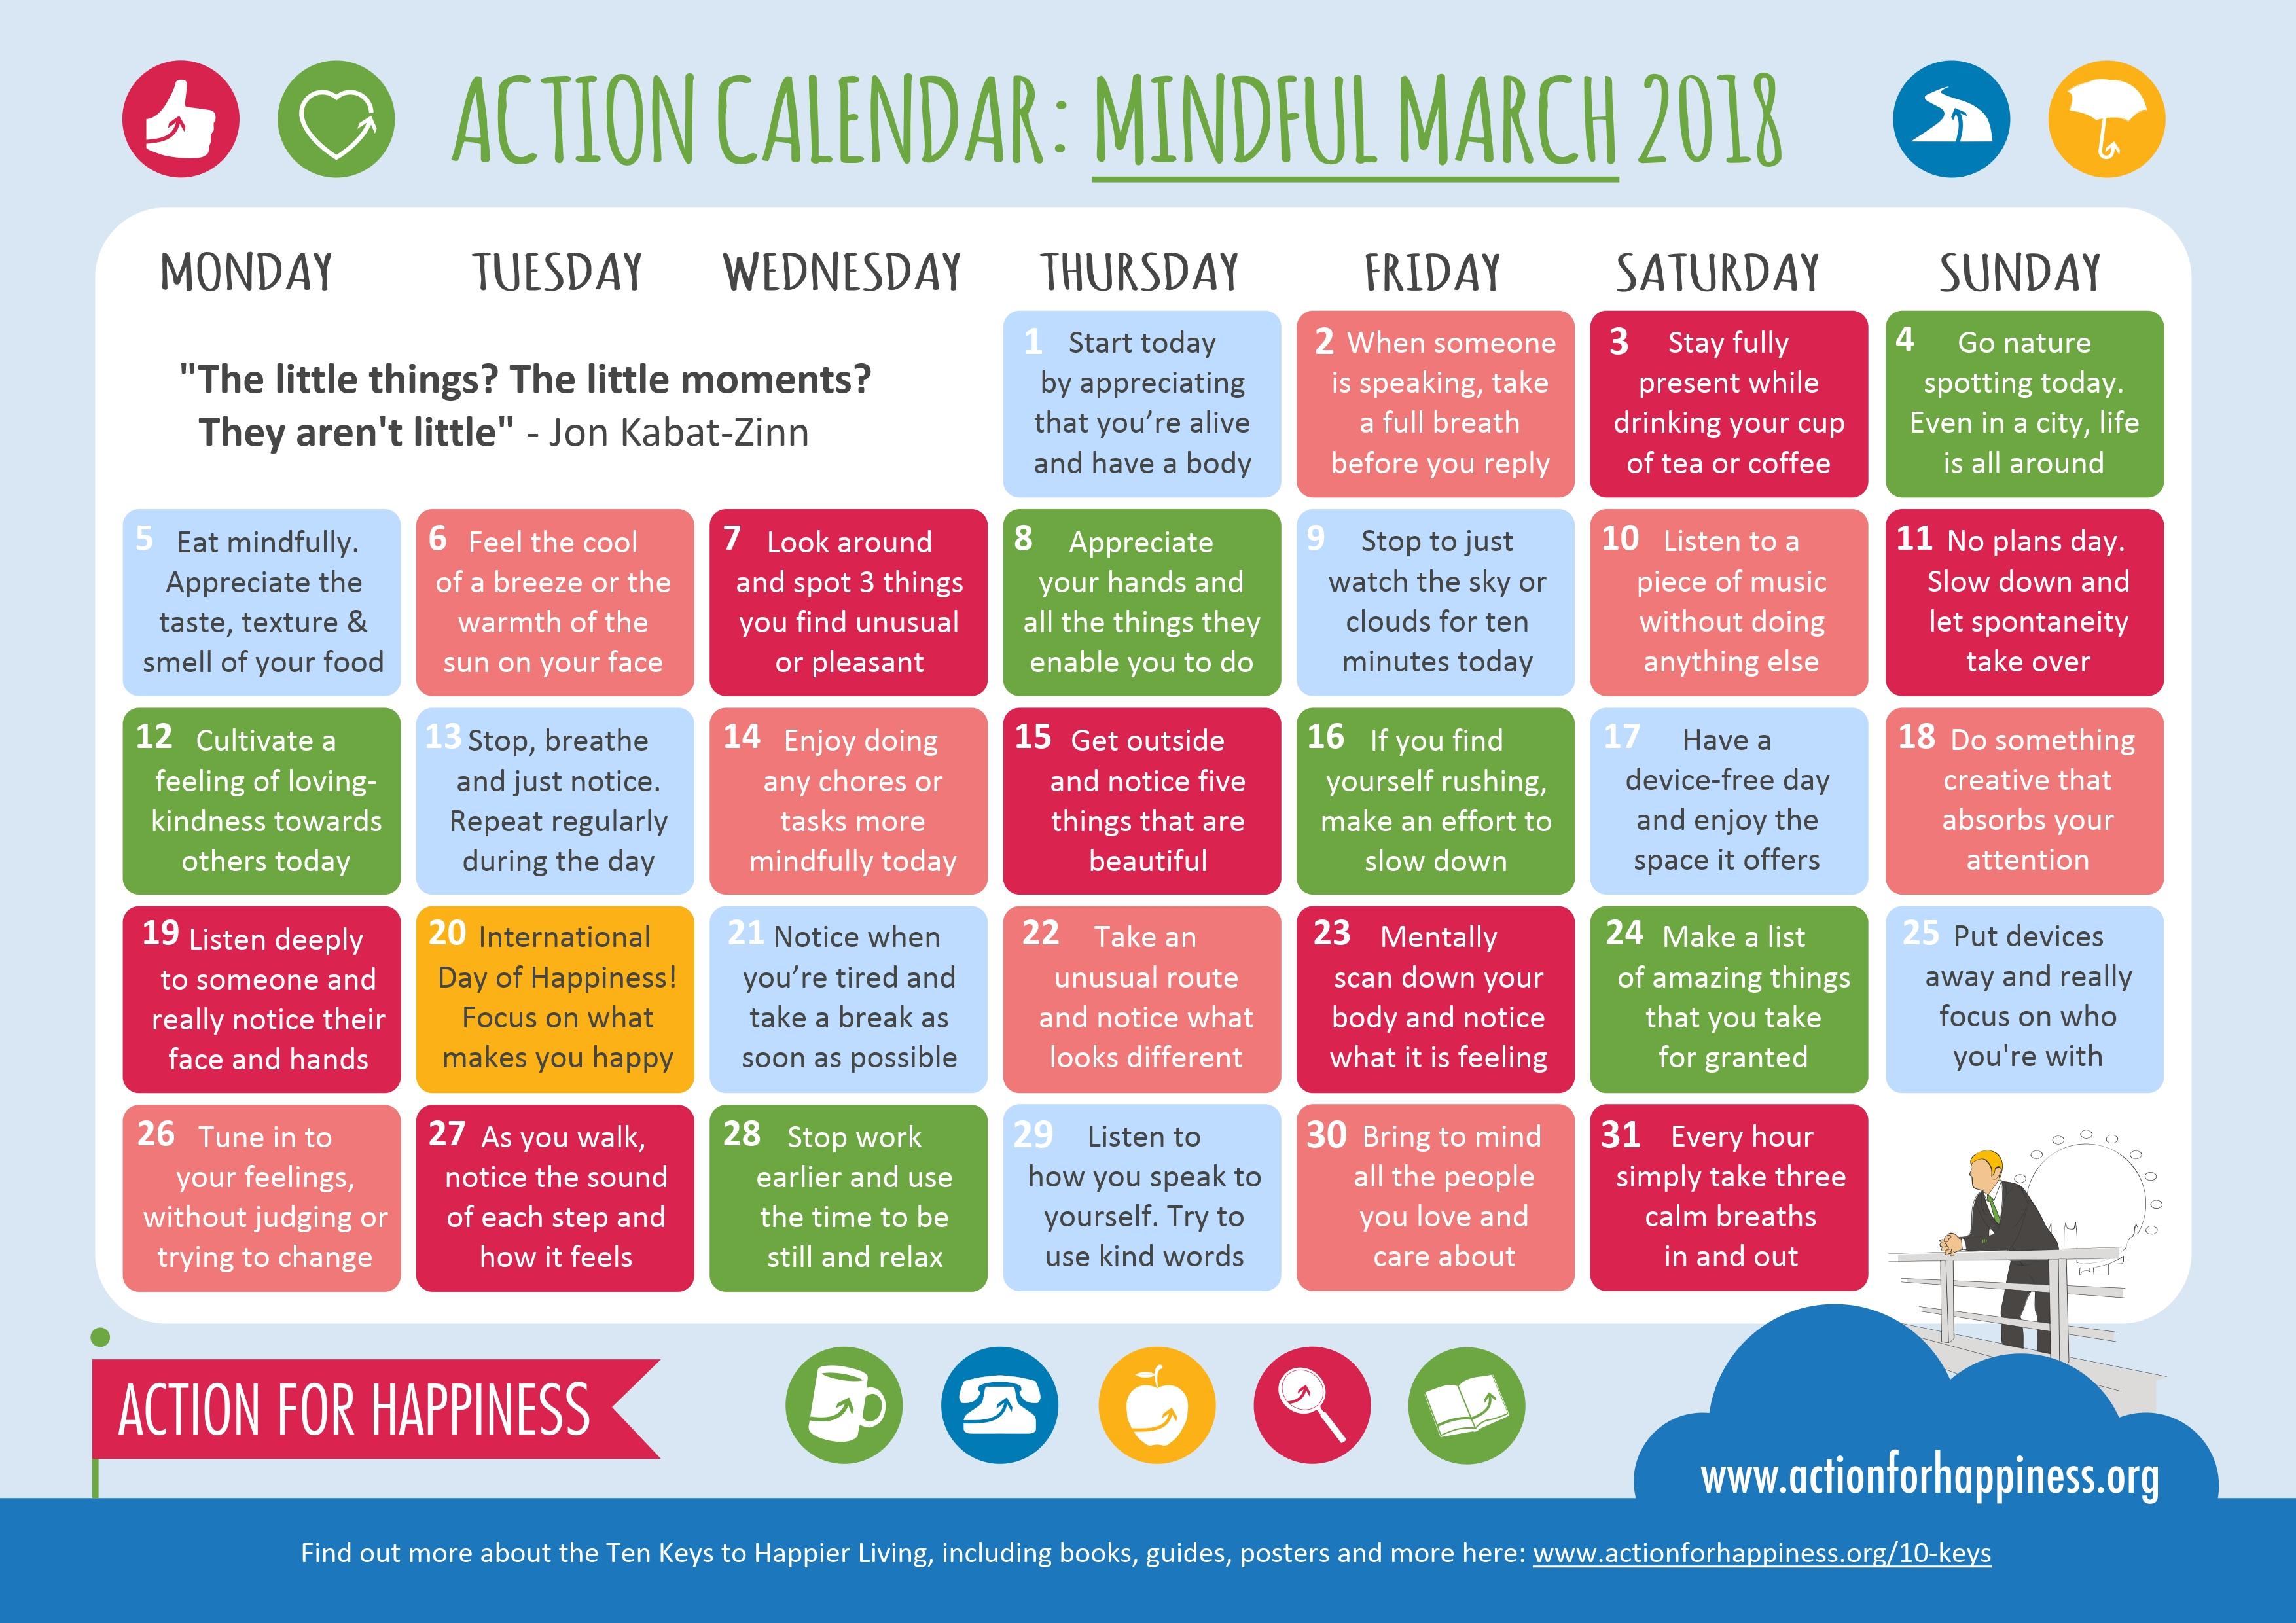 mindful_march action calendar.jpg